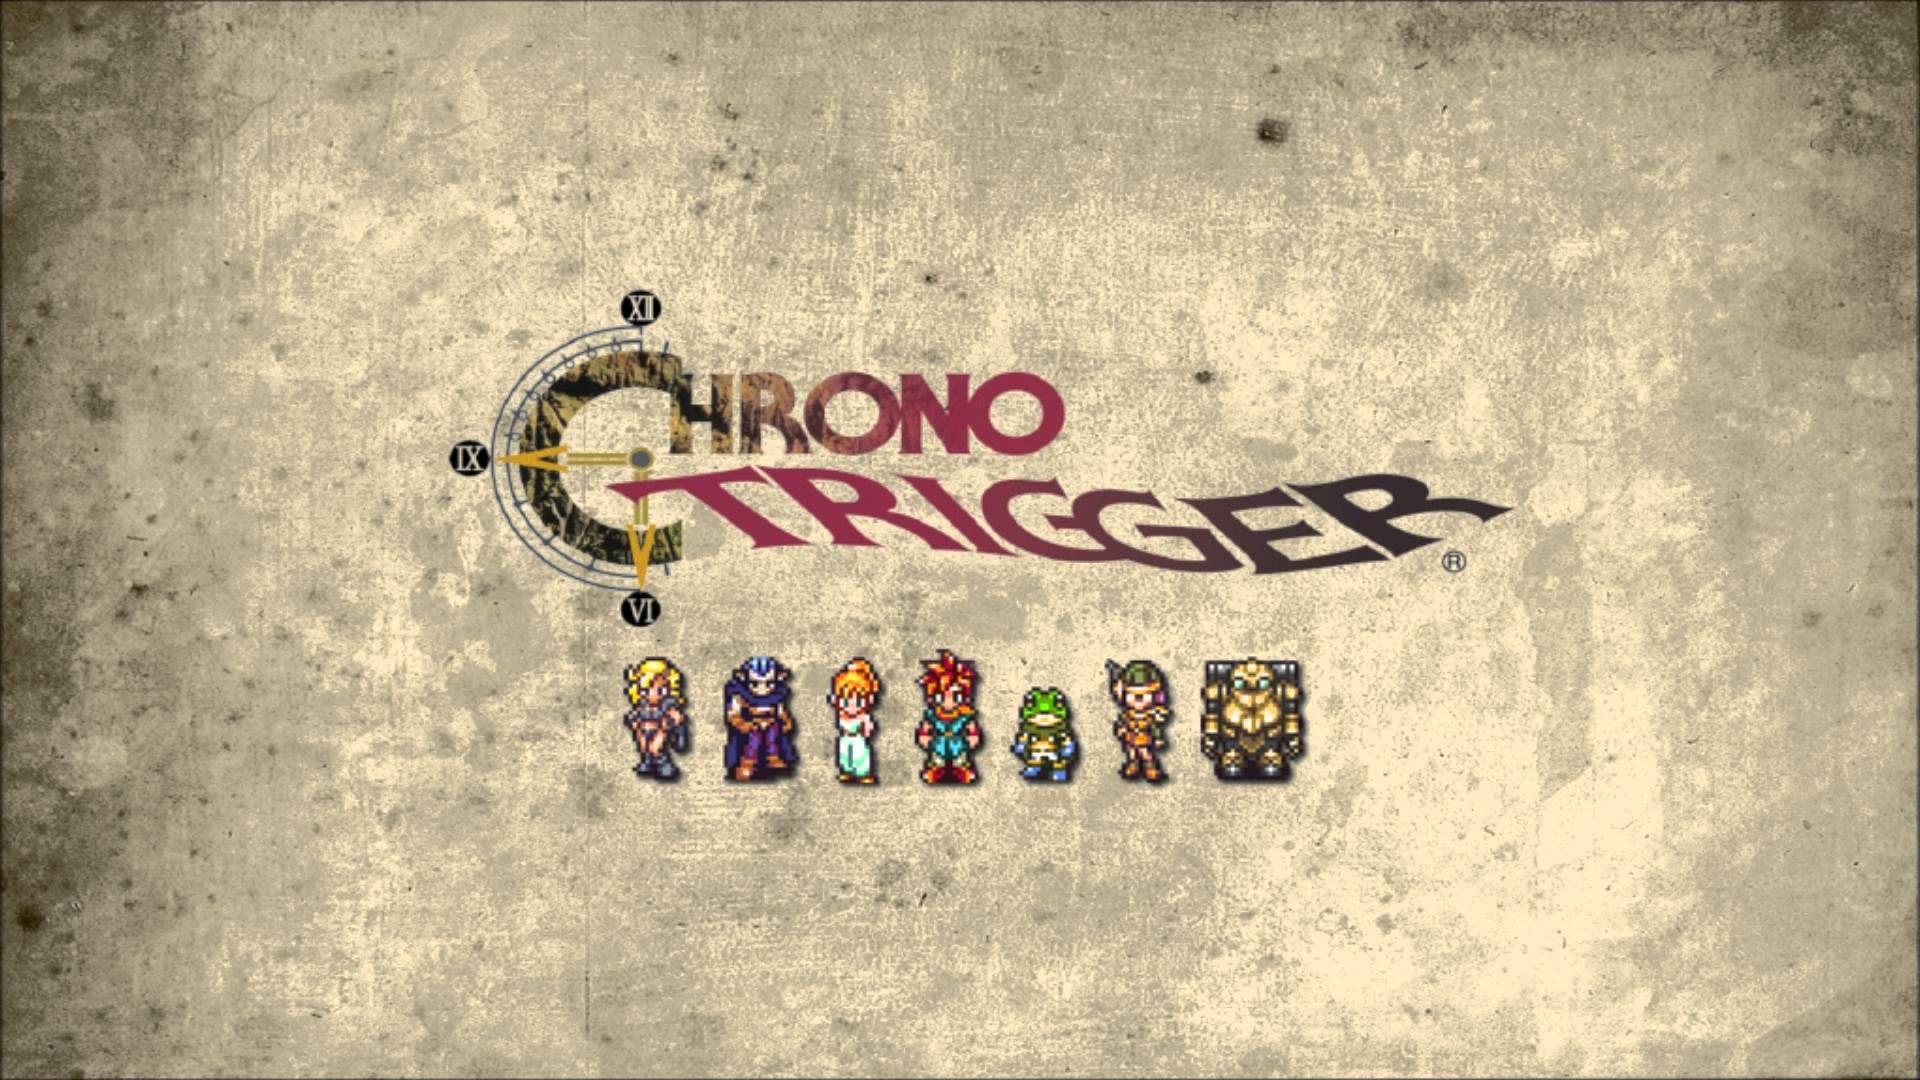 Chrono Trigger Schala S Theme Remastered Chrono Trigger Chrono Trigger